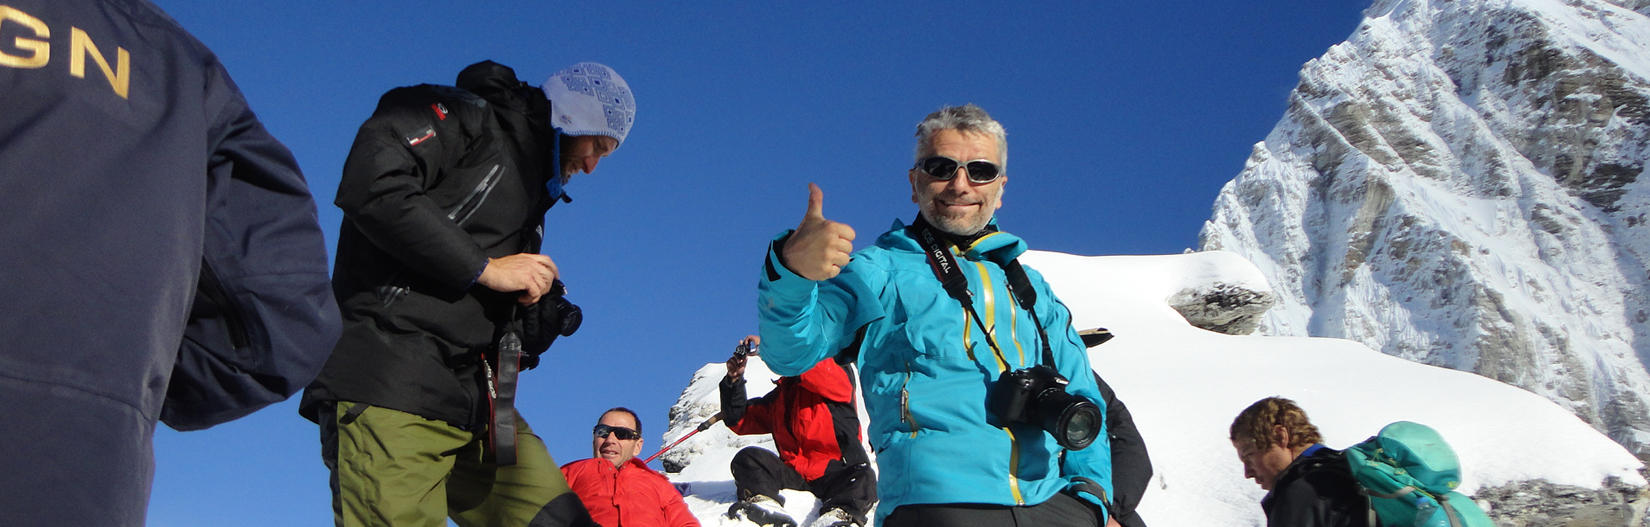 Trekking to Kala Pathar  5545m. (Everest Region)